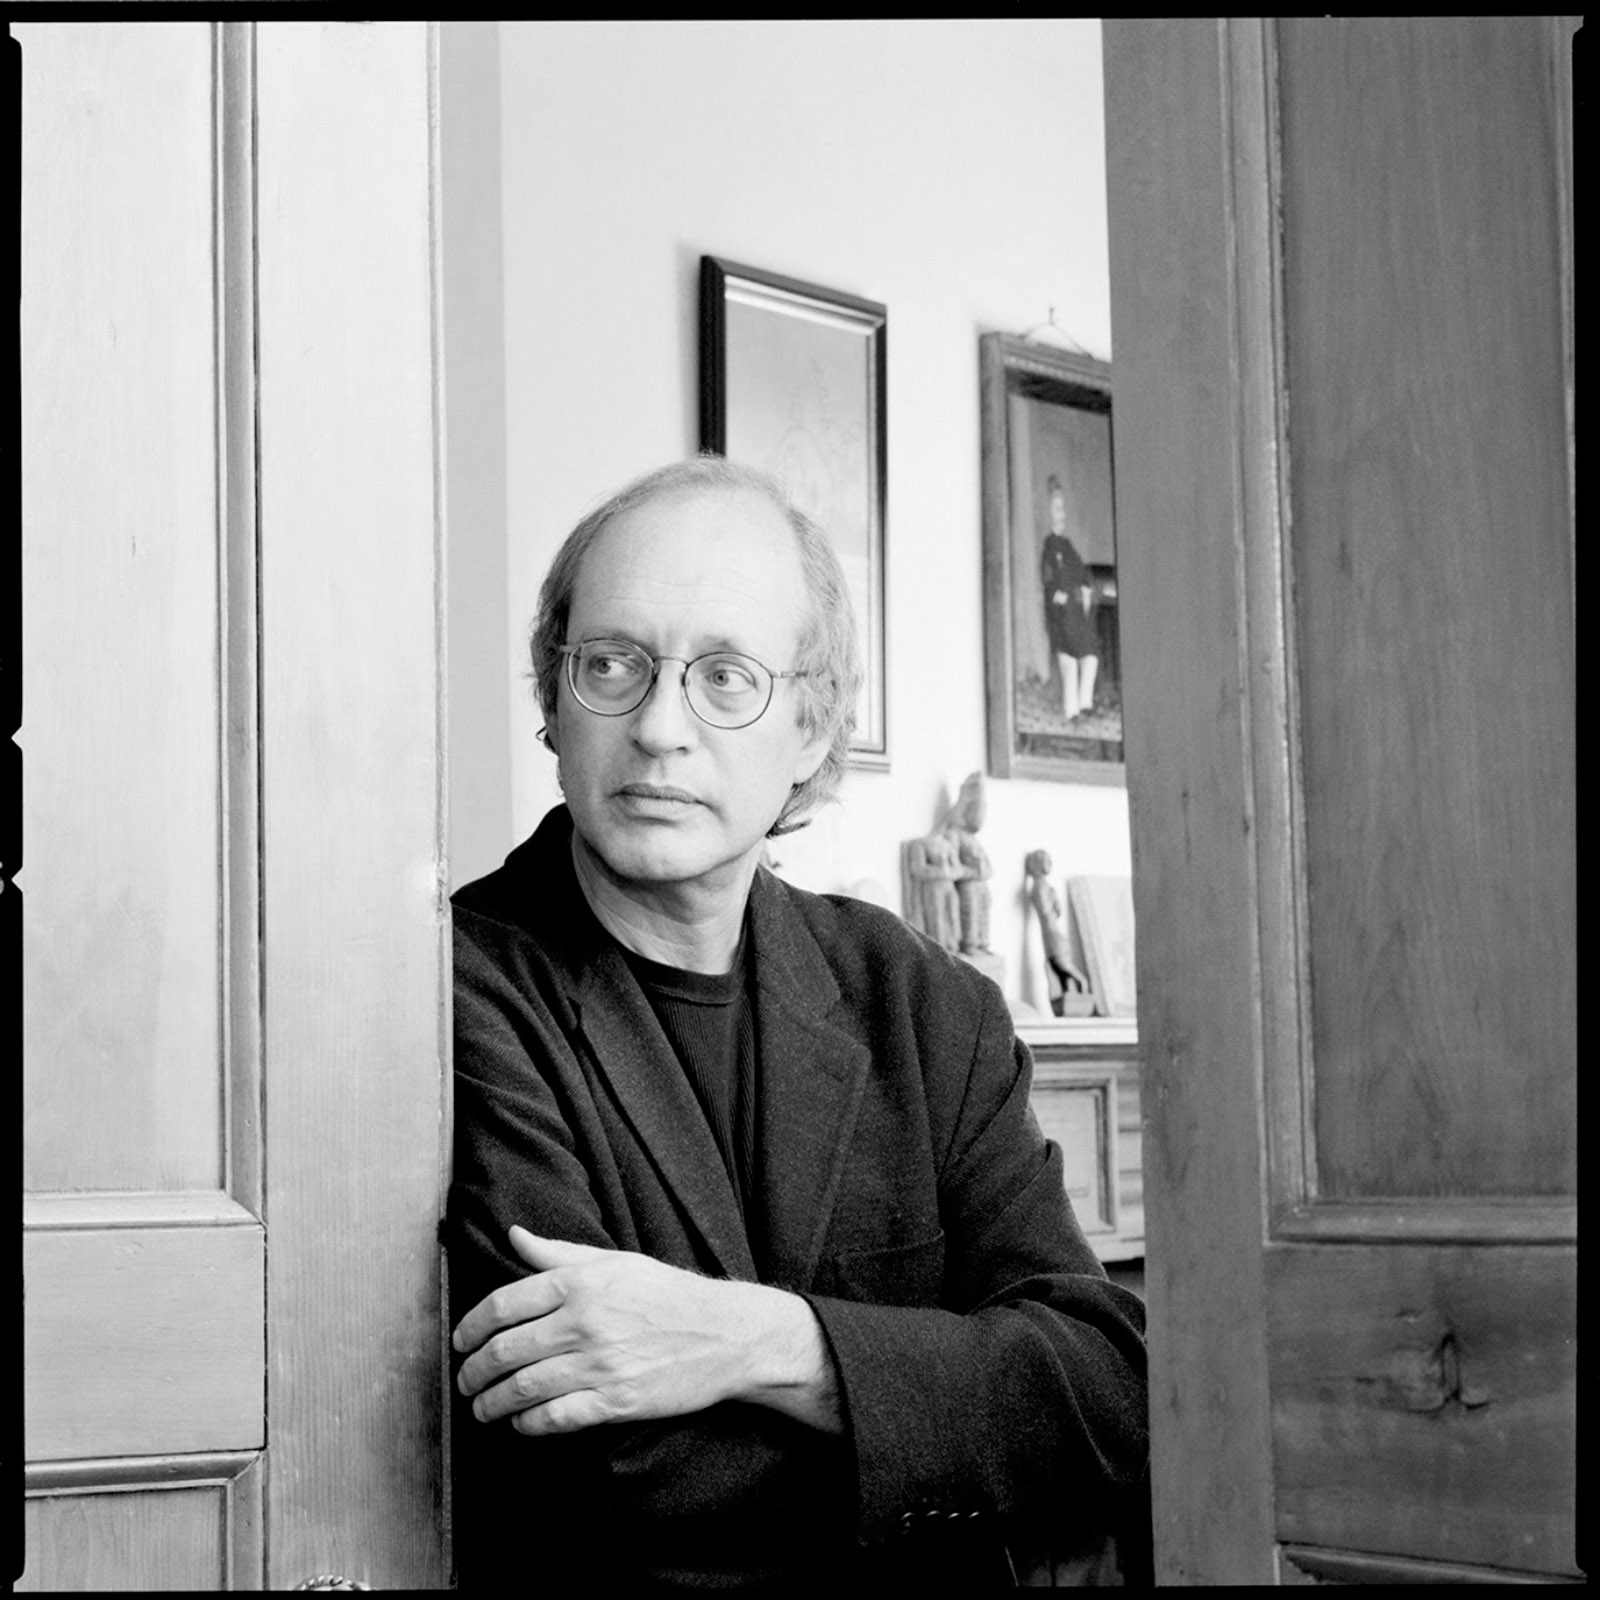 Eliot Weinberger, New York City, circa 2000